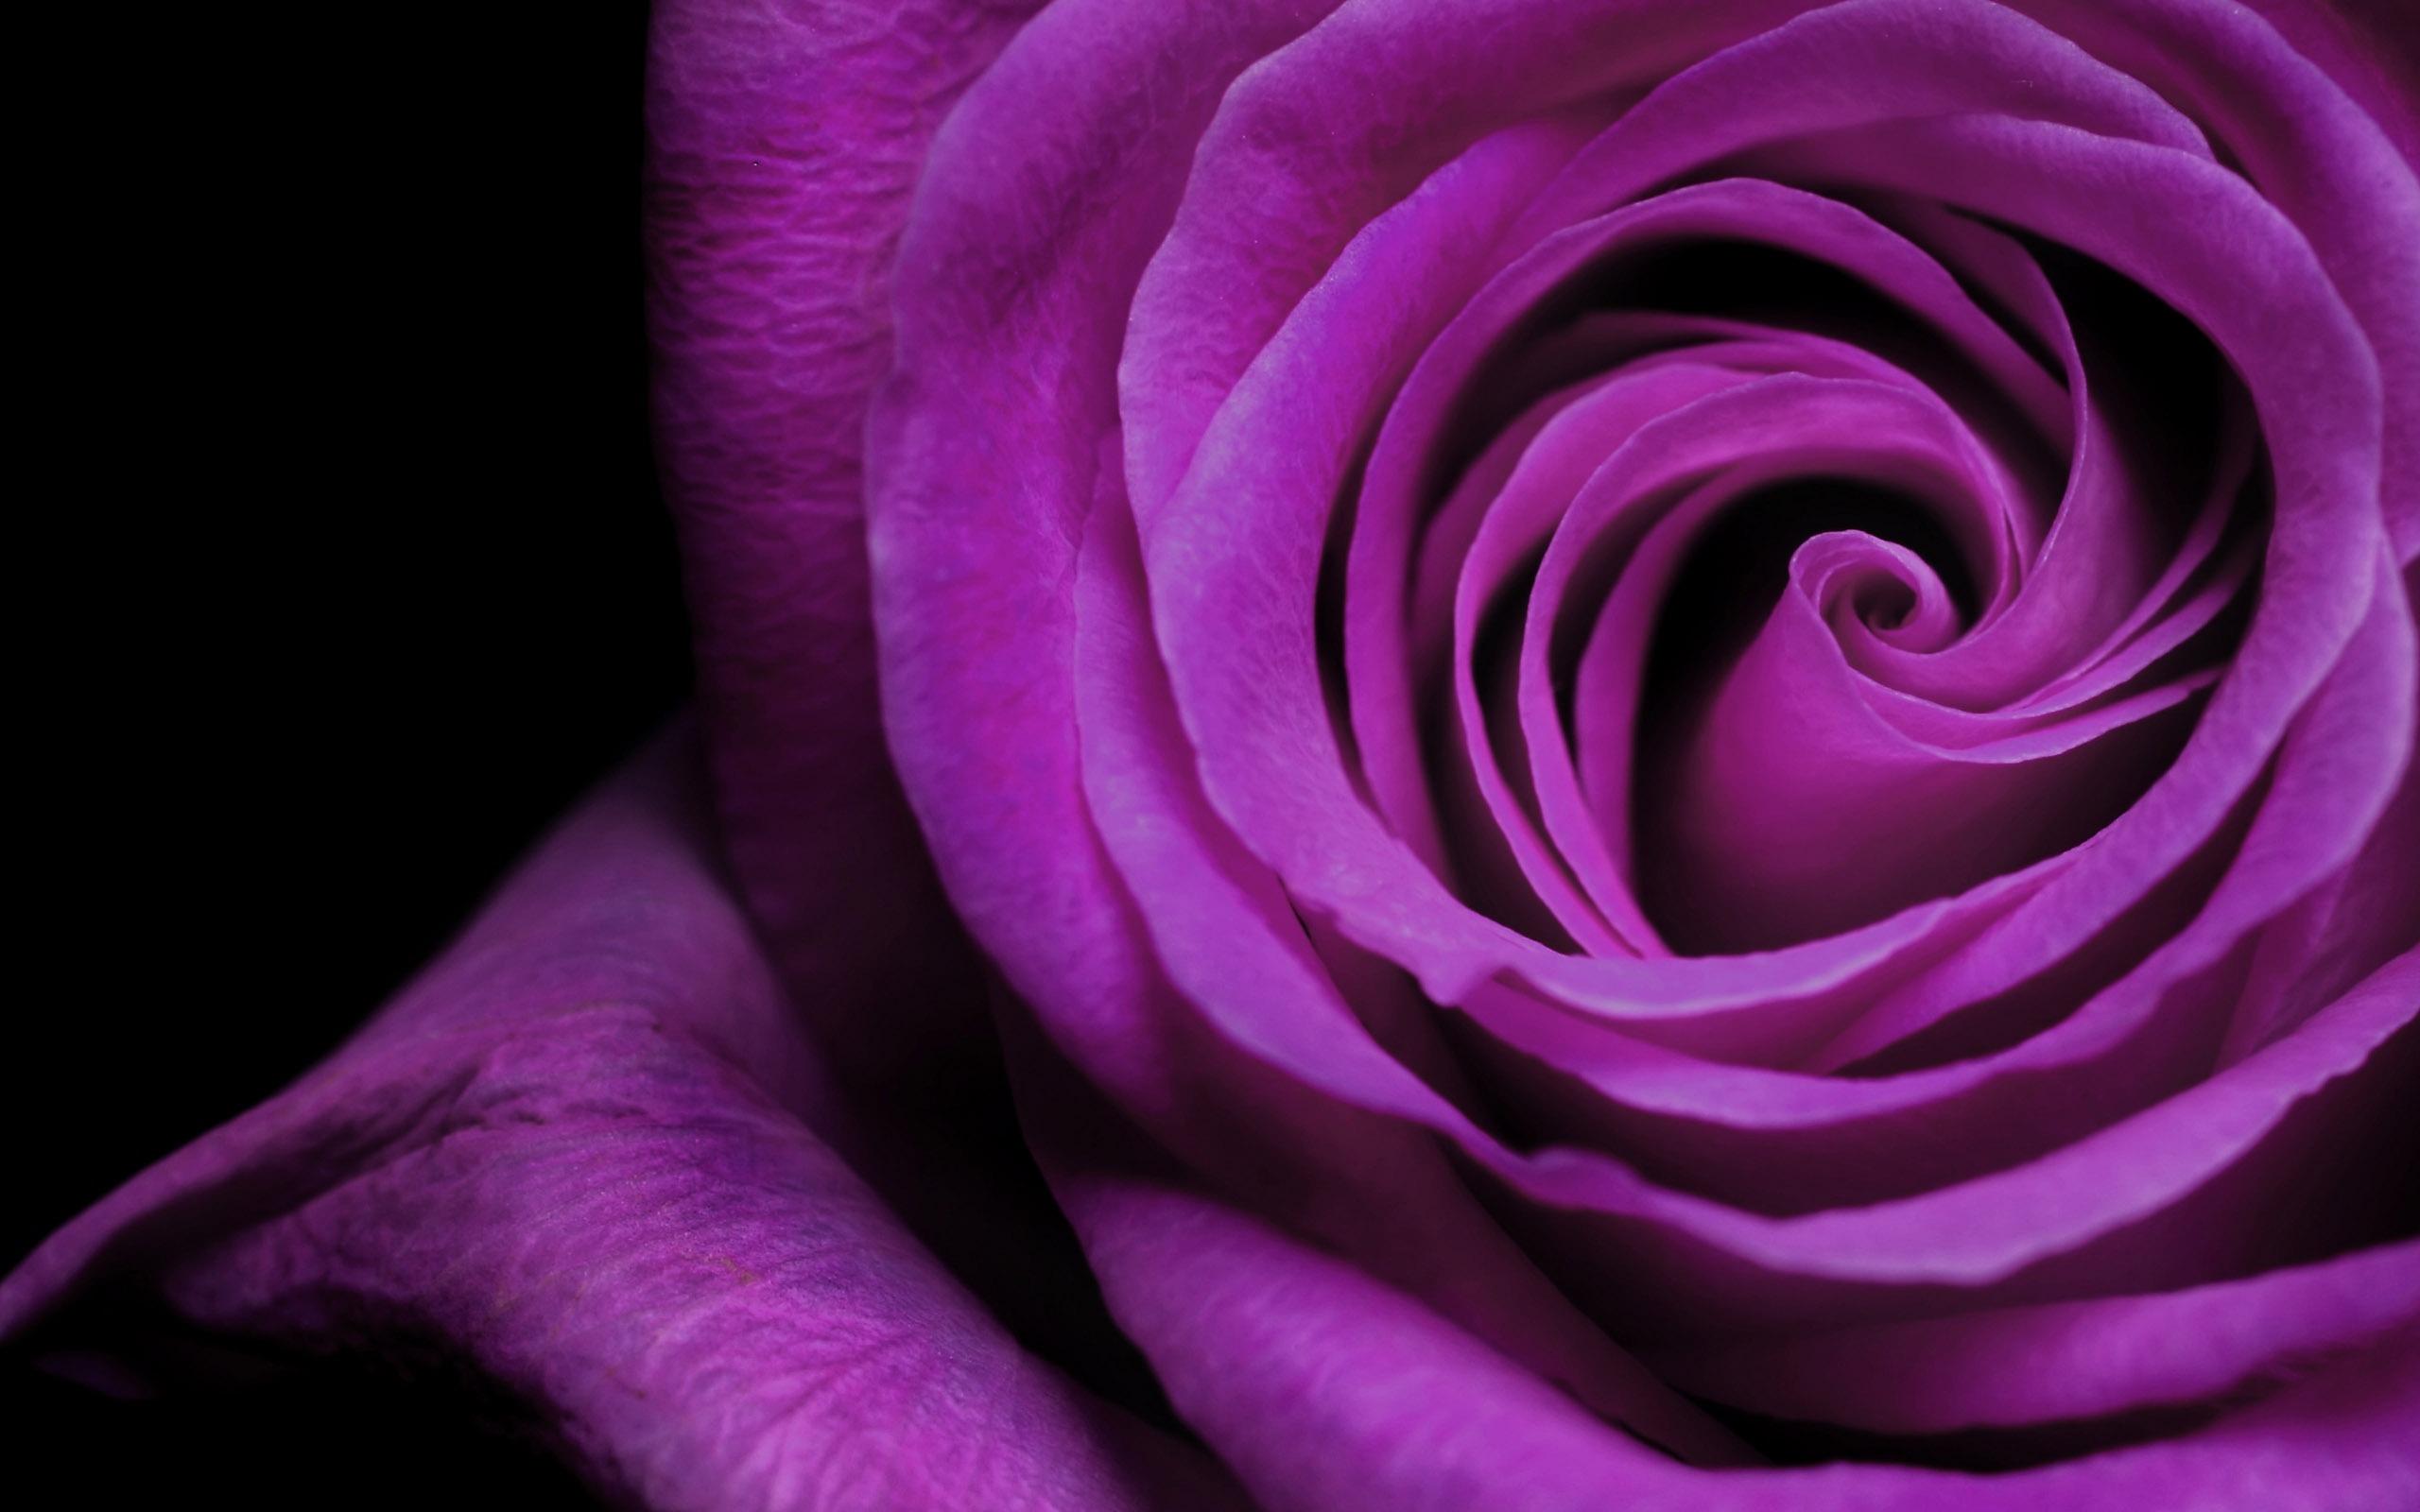 1600_Black And purple rose wallpapers.jp